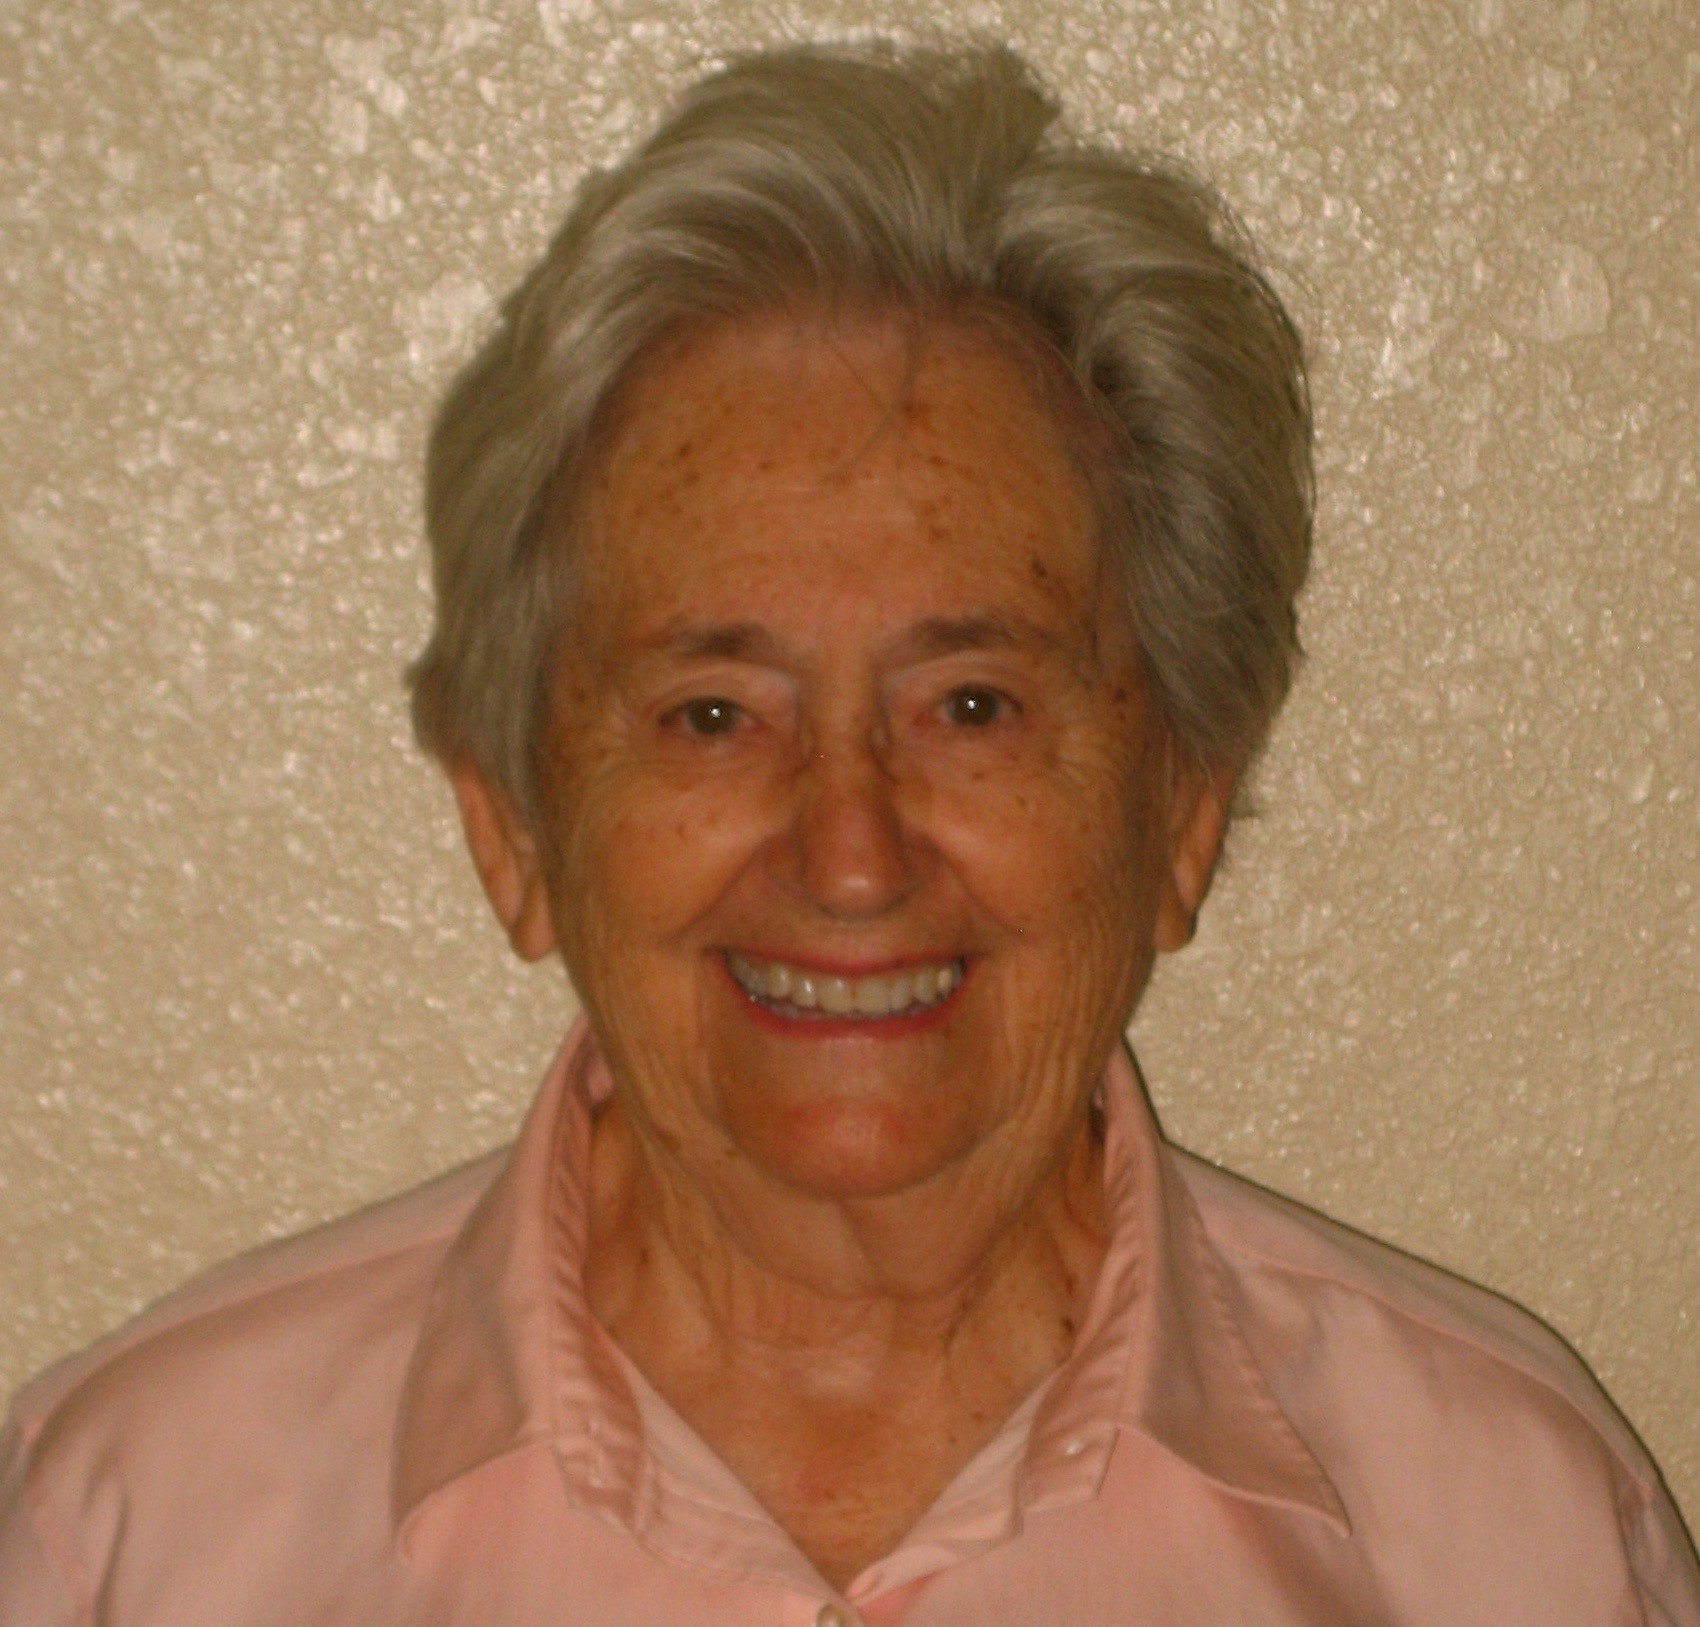 Bernice Schwindt, 89, formerly of Morrill